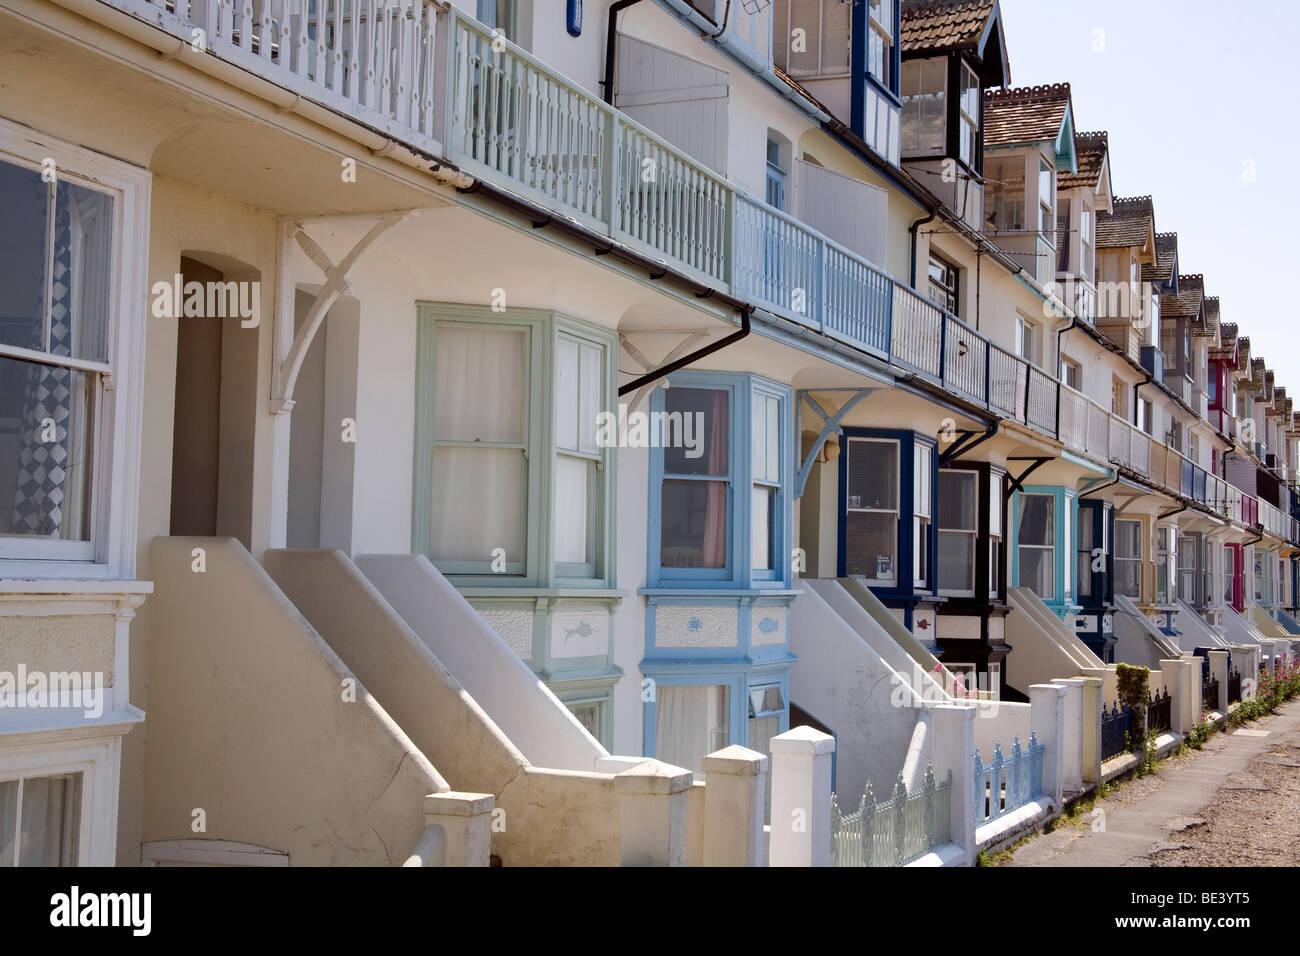 Reihe von Häusern am Strand Whitstable Kent, UK Stockbild